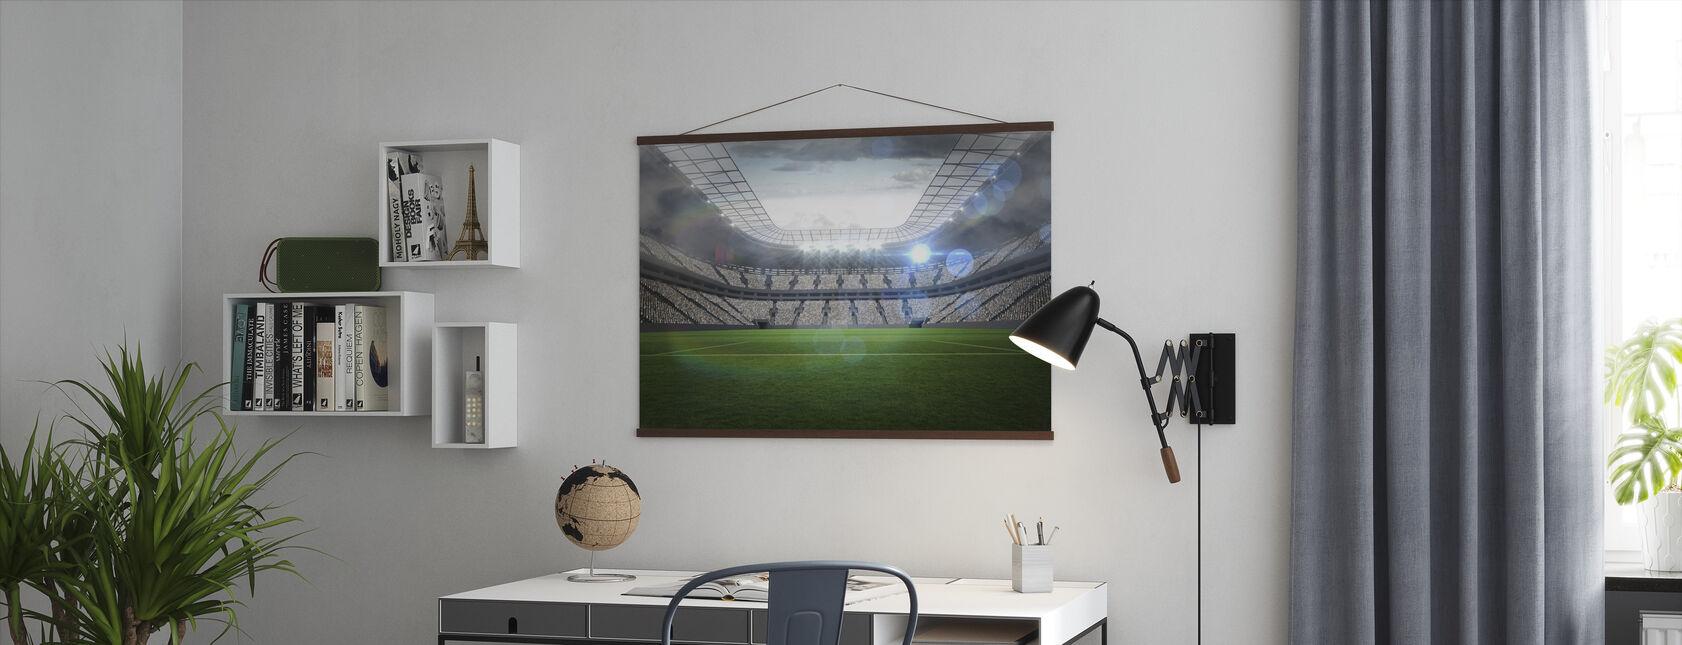 Voetbalstadion - Poster - Kantoor